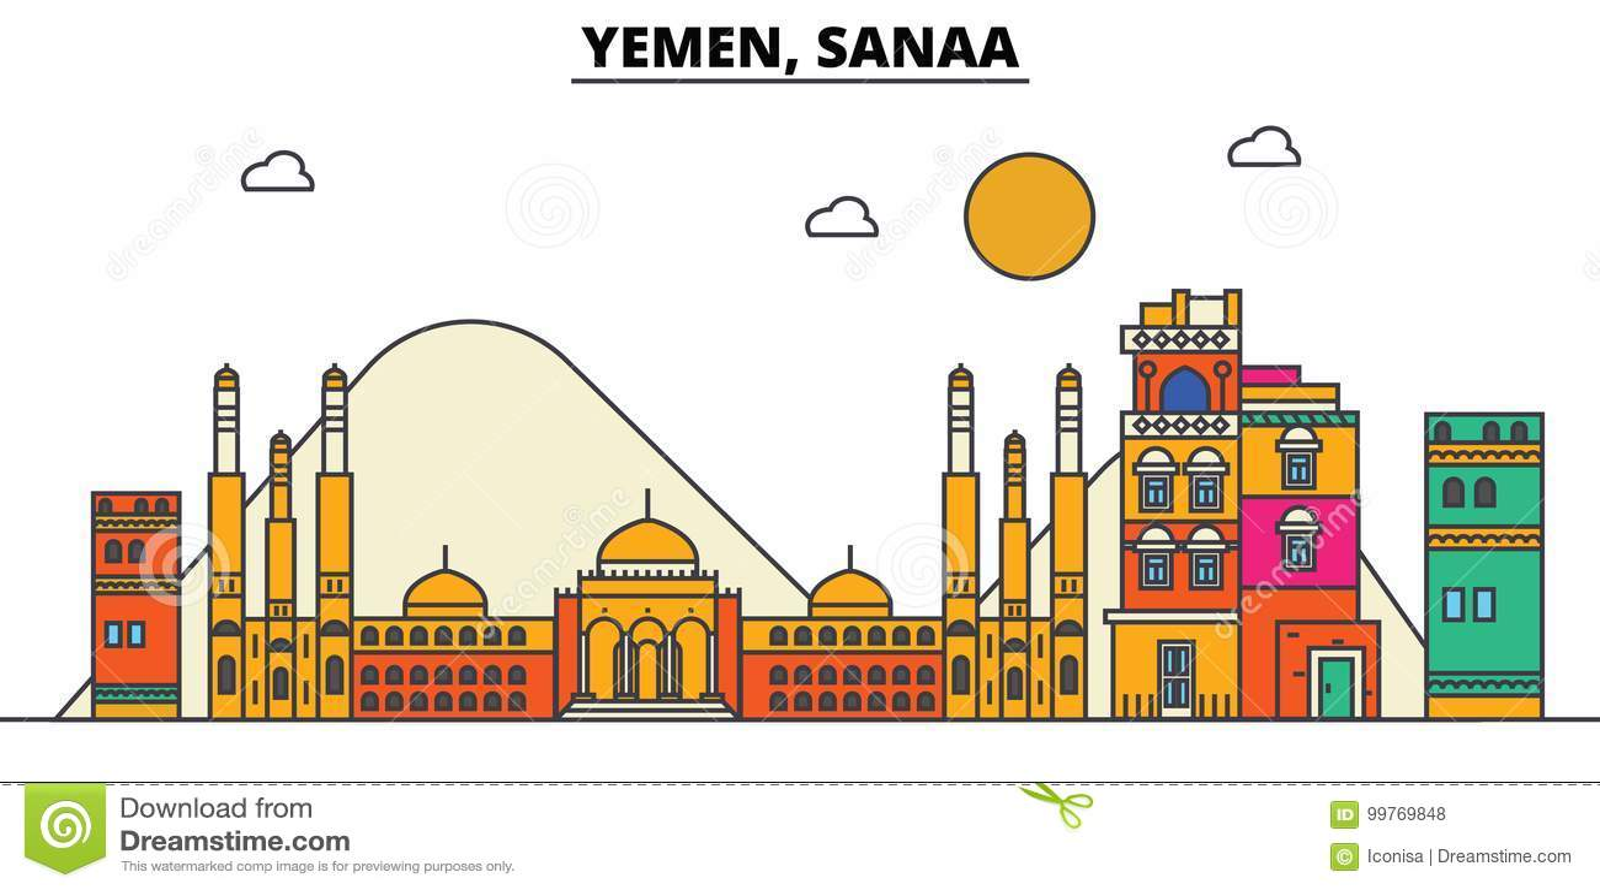 Yemen, Sanaa De architectuur van de stadshorizon editable